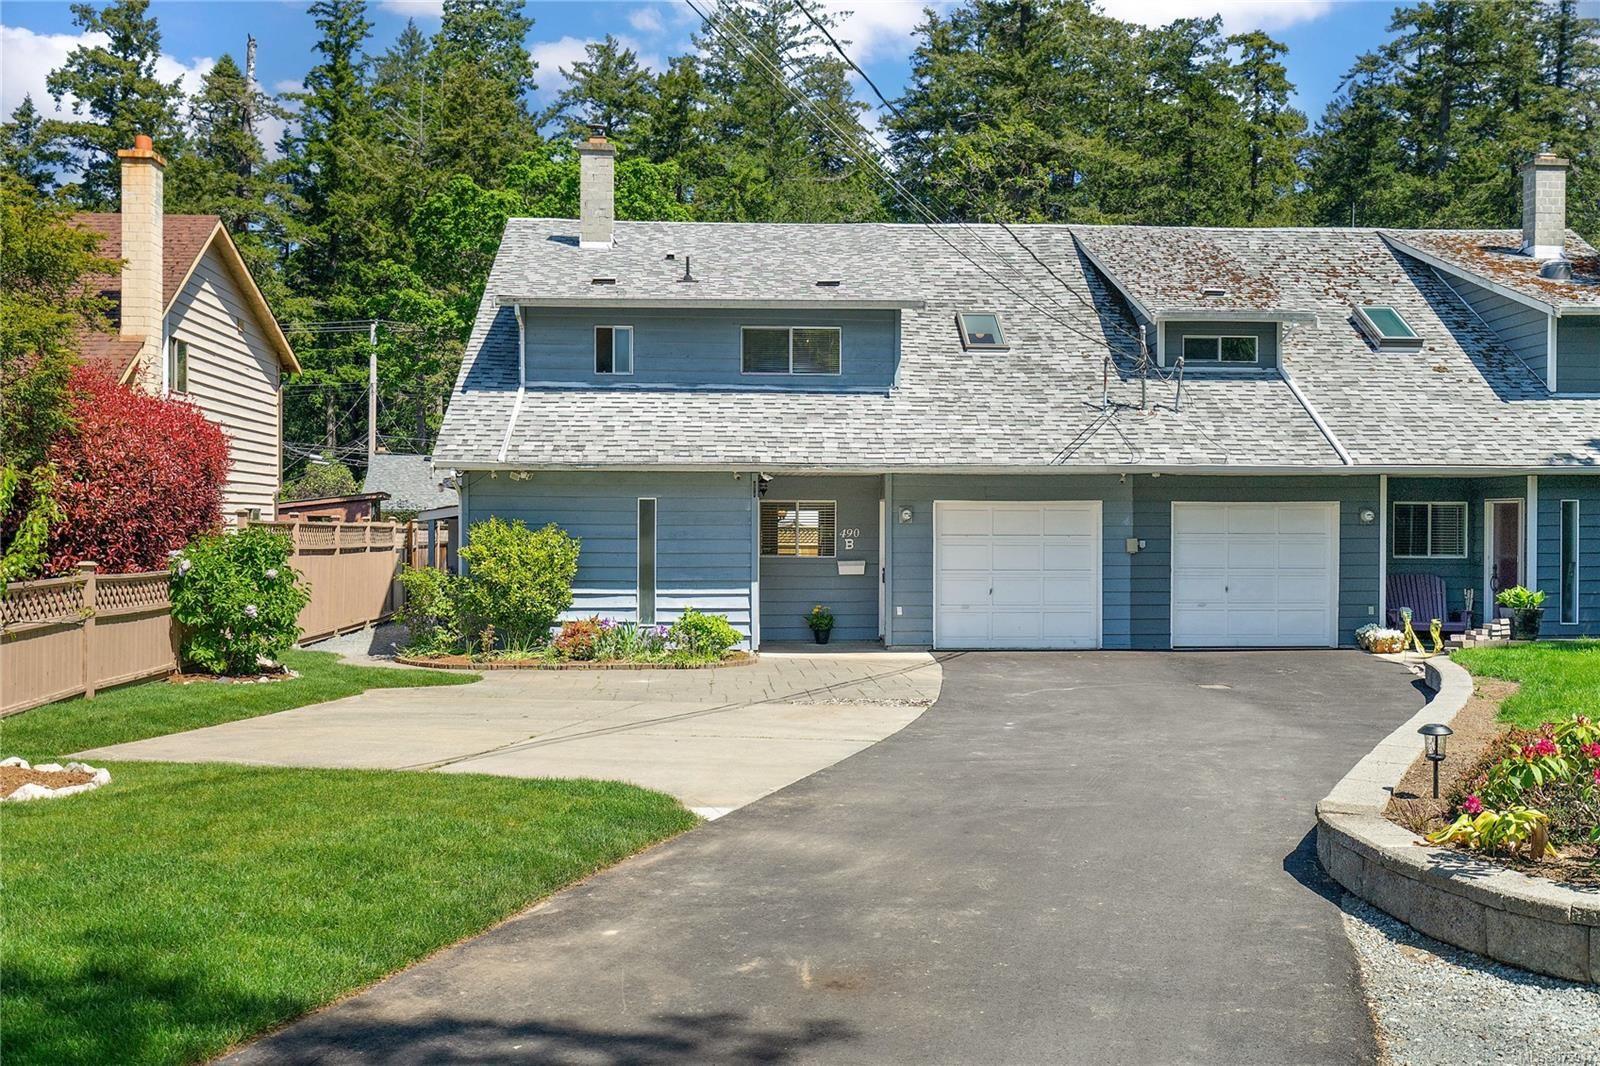 Main Photo: B 490 Terrahue Rd in : Co Wishart South Half Duplex for sale (Colwood)  : MLS®# 875947